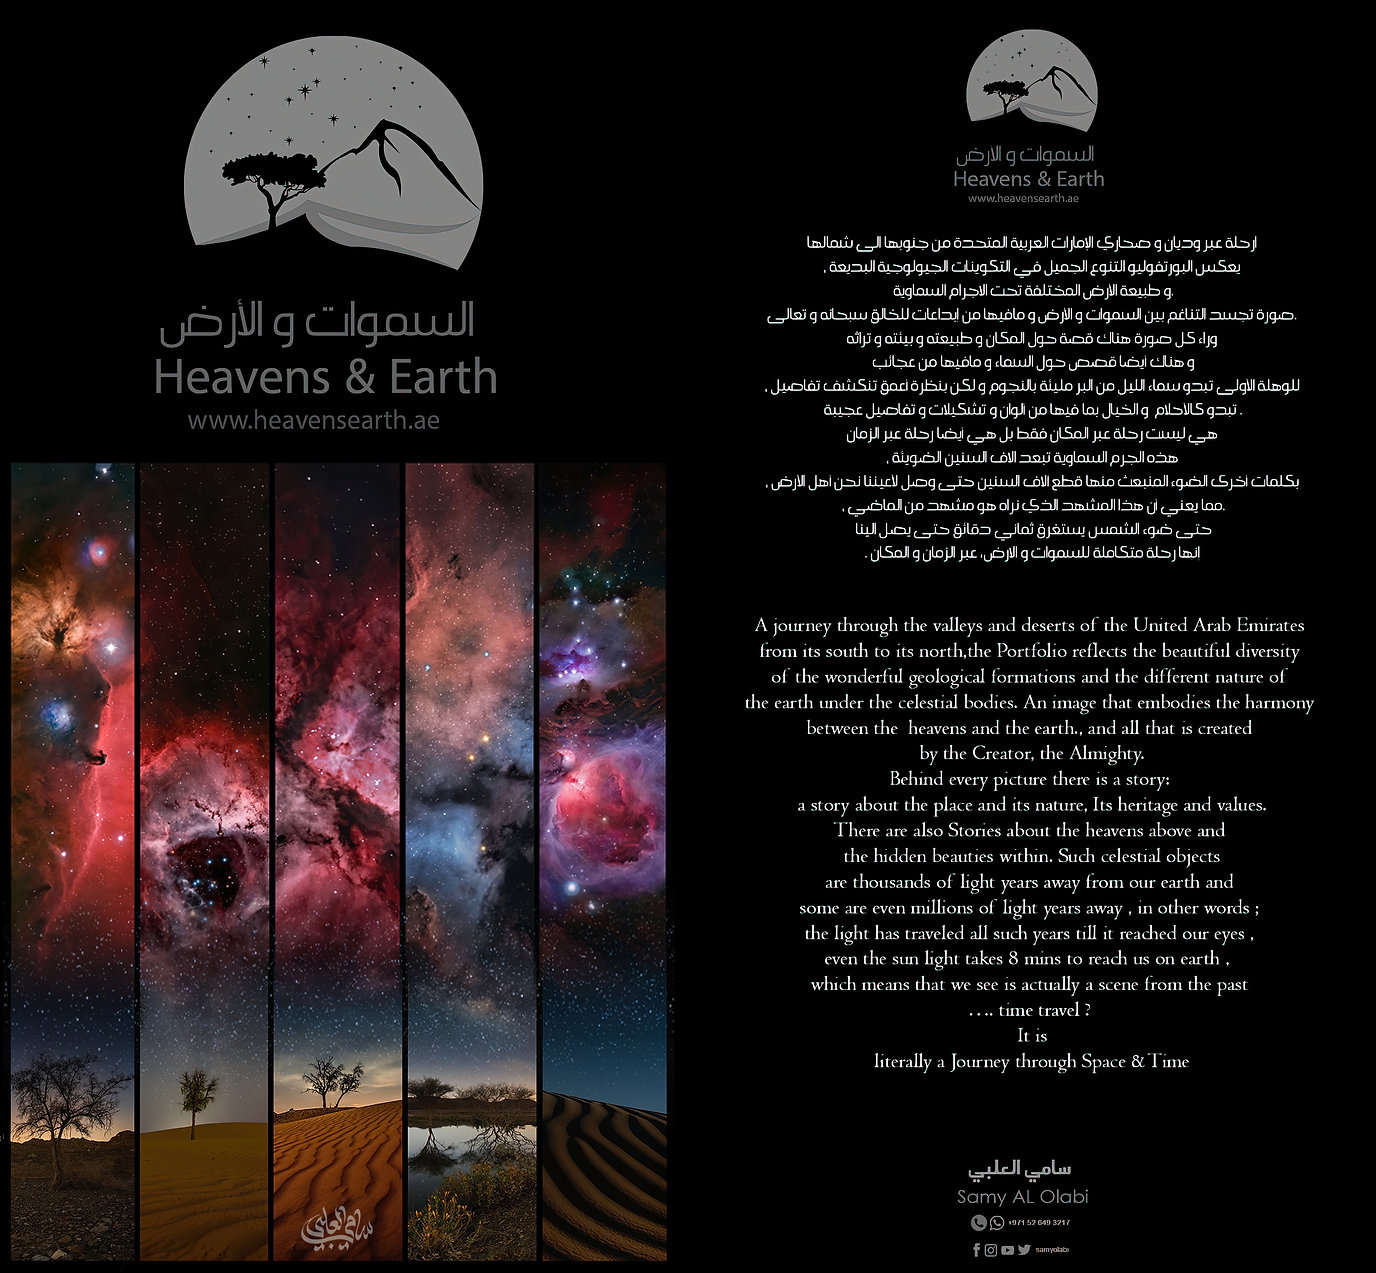 Heavens & Earth Brochure-gigapixel-scale